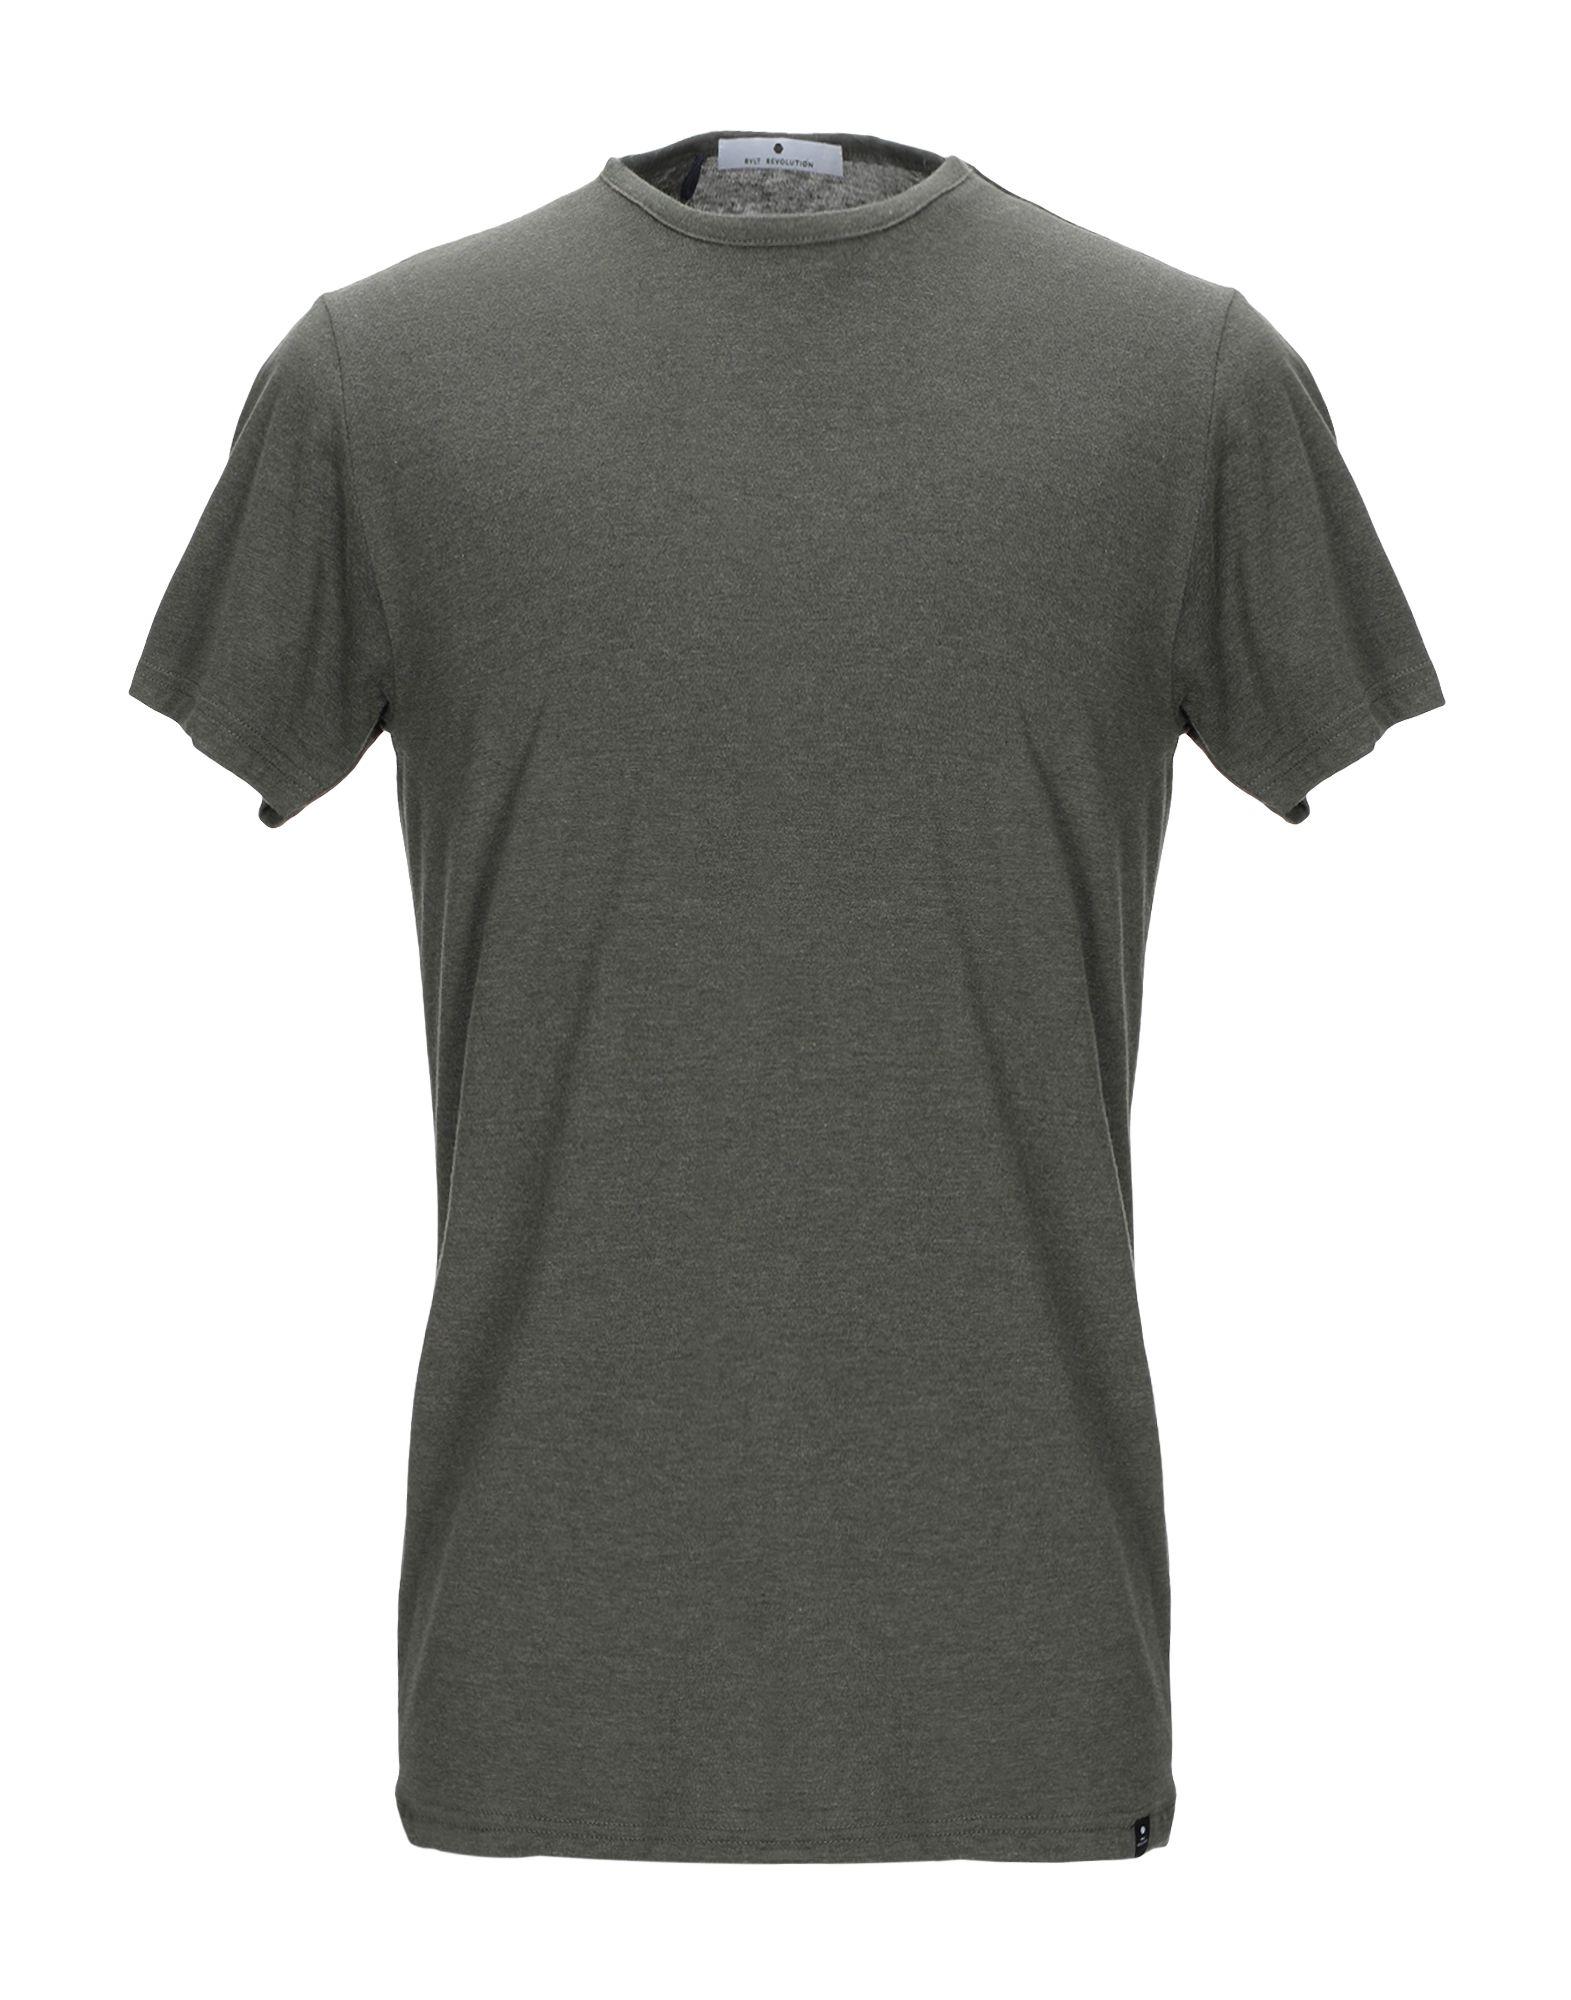 T-Shirt Rvlt Revolution uomo - 12363329SL 12363329SL